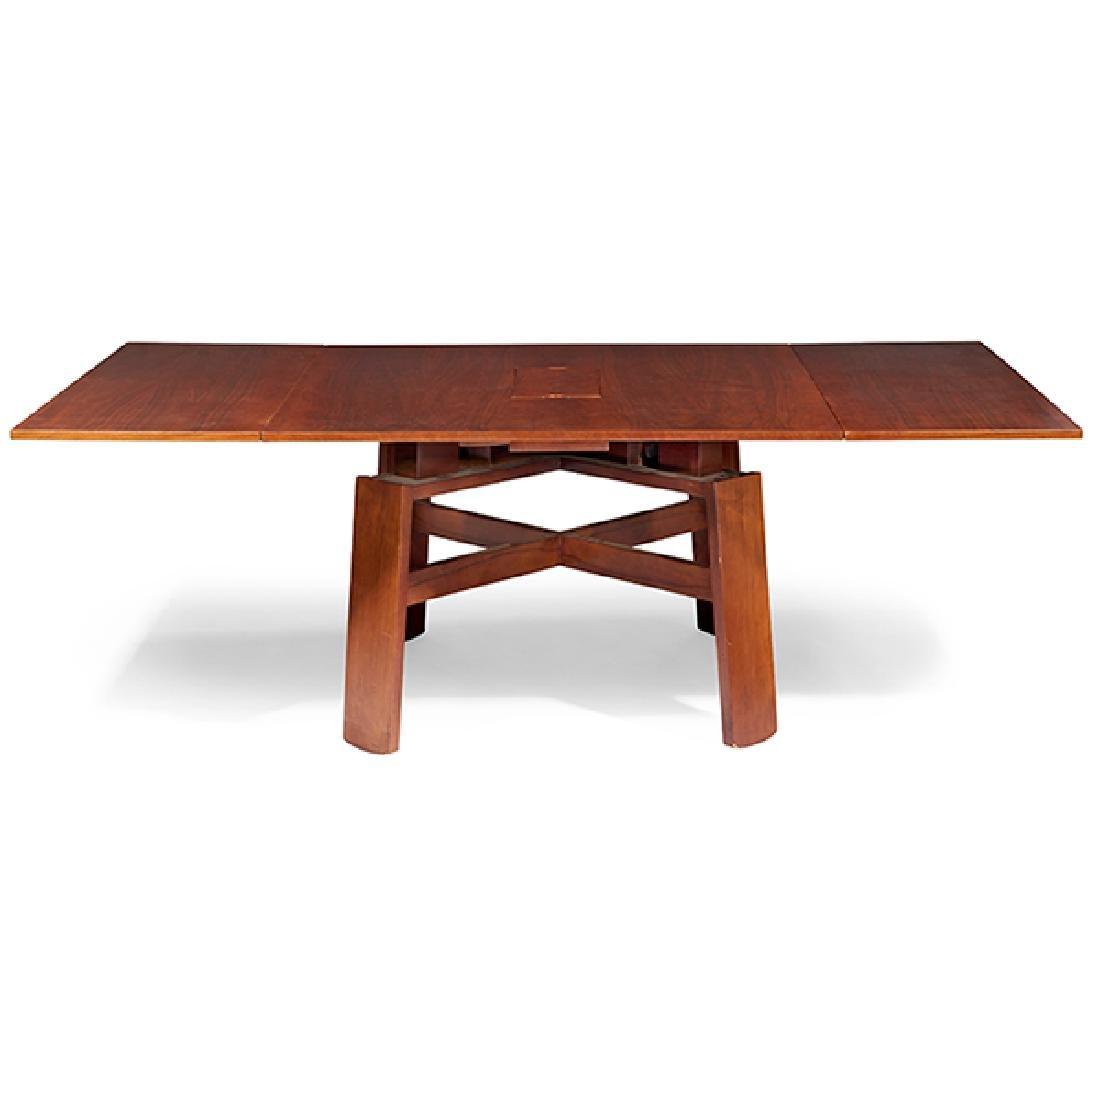 Silvio Coppola (1920-1985) for Sormani dining table